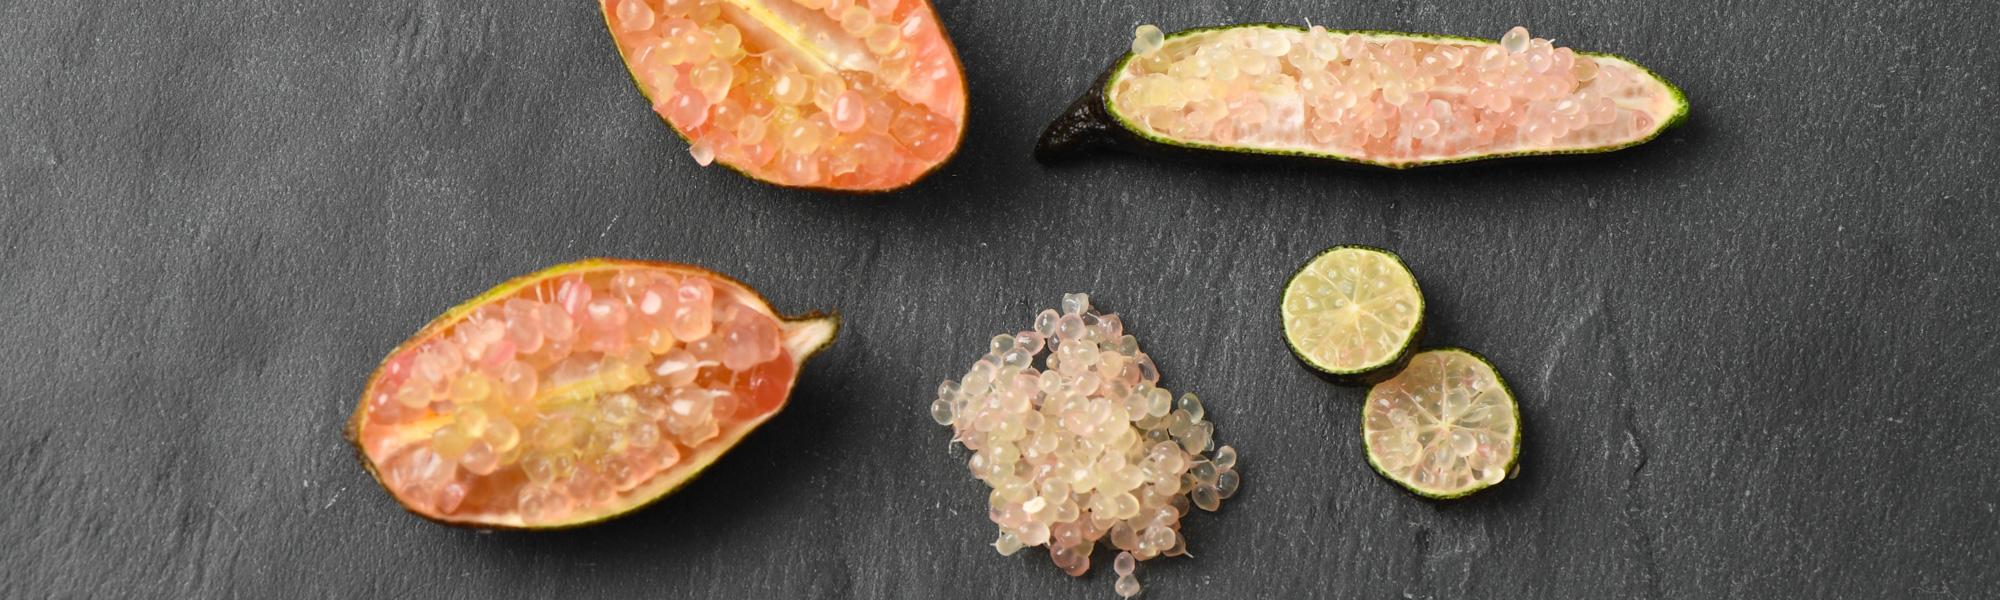 Témoignage : Quand Jos de Koning rencontre le citron caviar